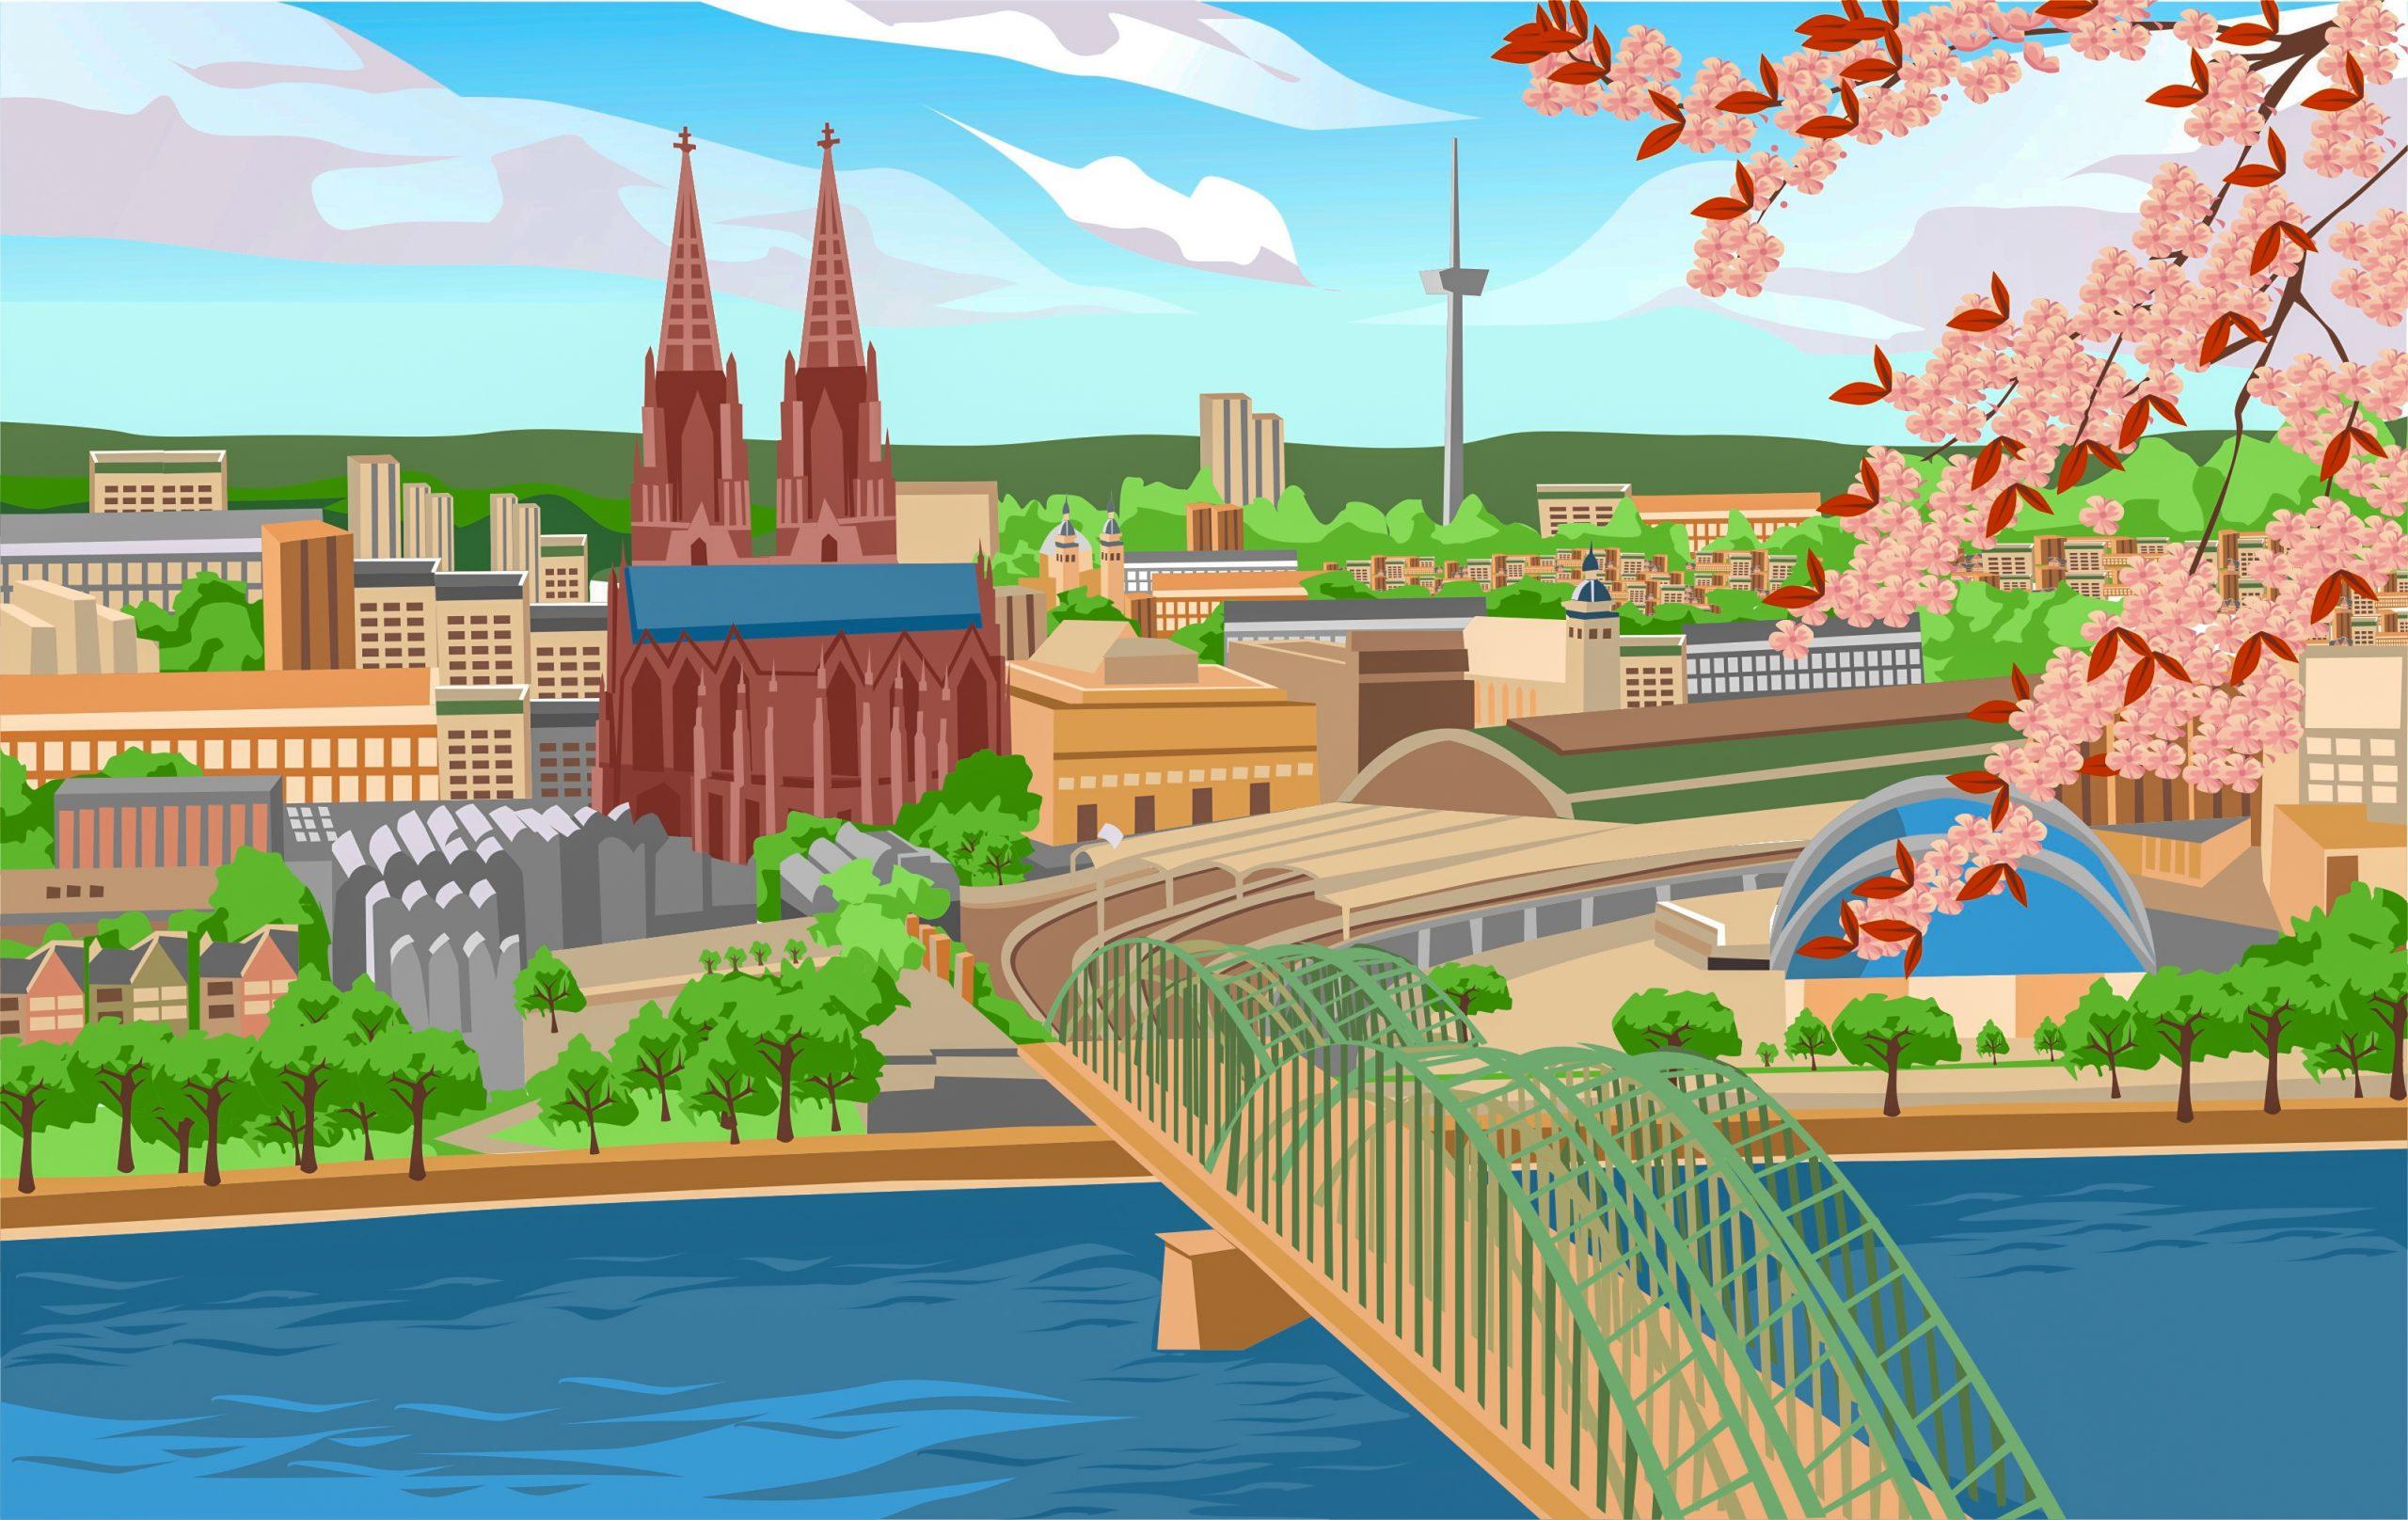 Pop-Up in Köln